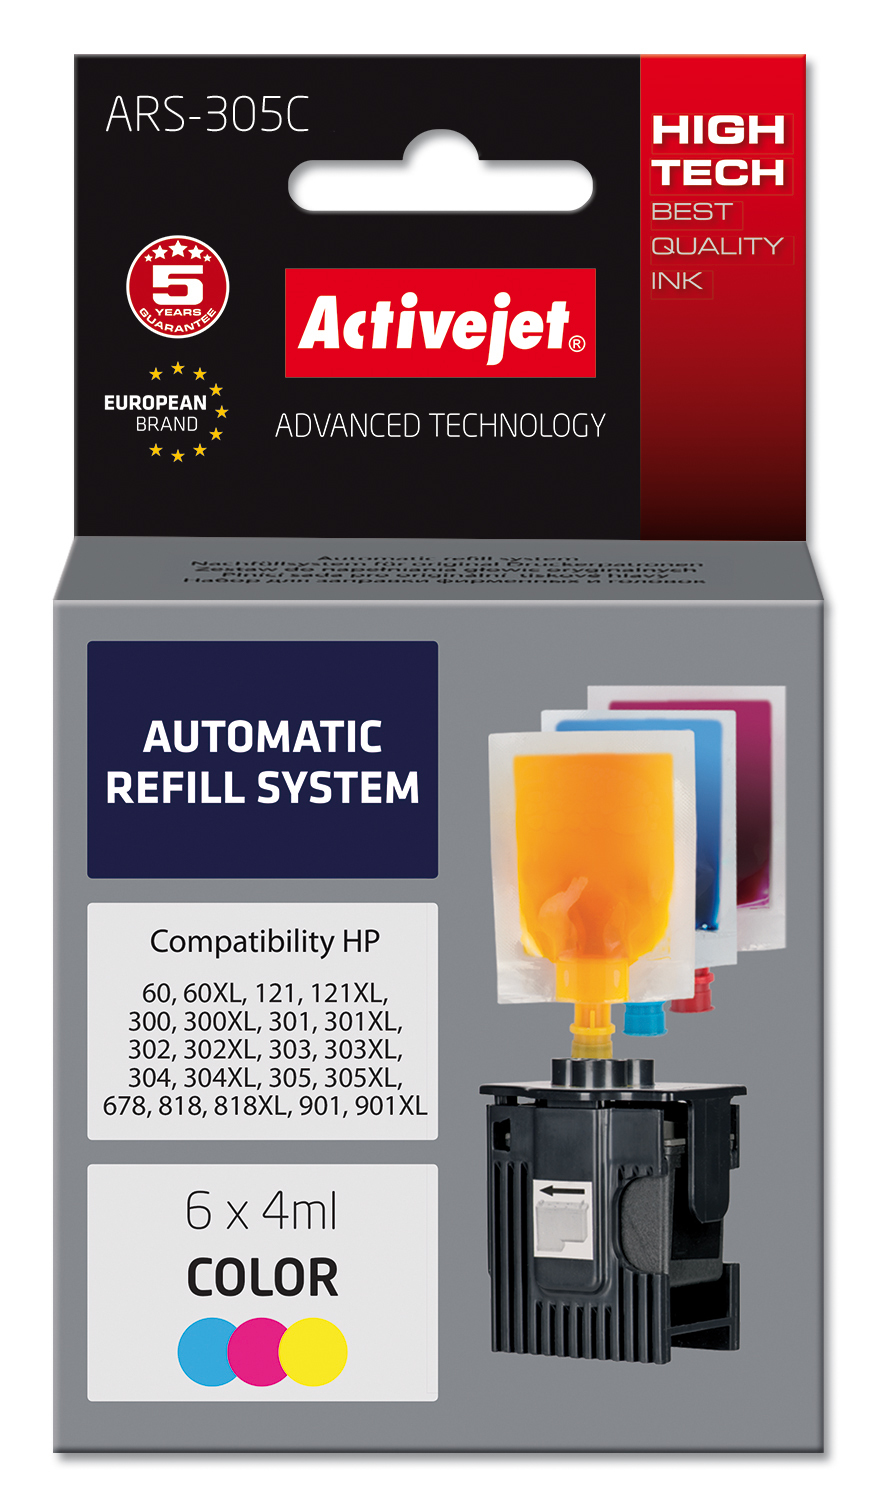 System uzupełnień Activejet ARS-305Col (zamiennik HP301, HP302, HP303, HP304, HP304 ; 6 x 4 ml; kolor)